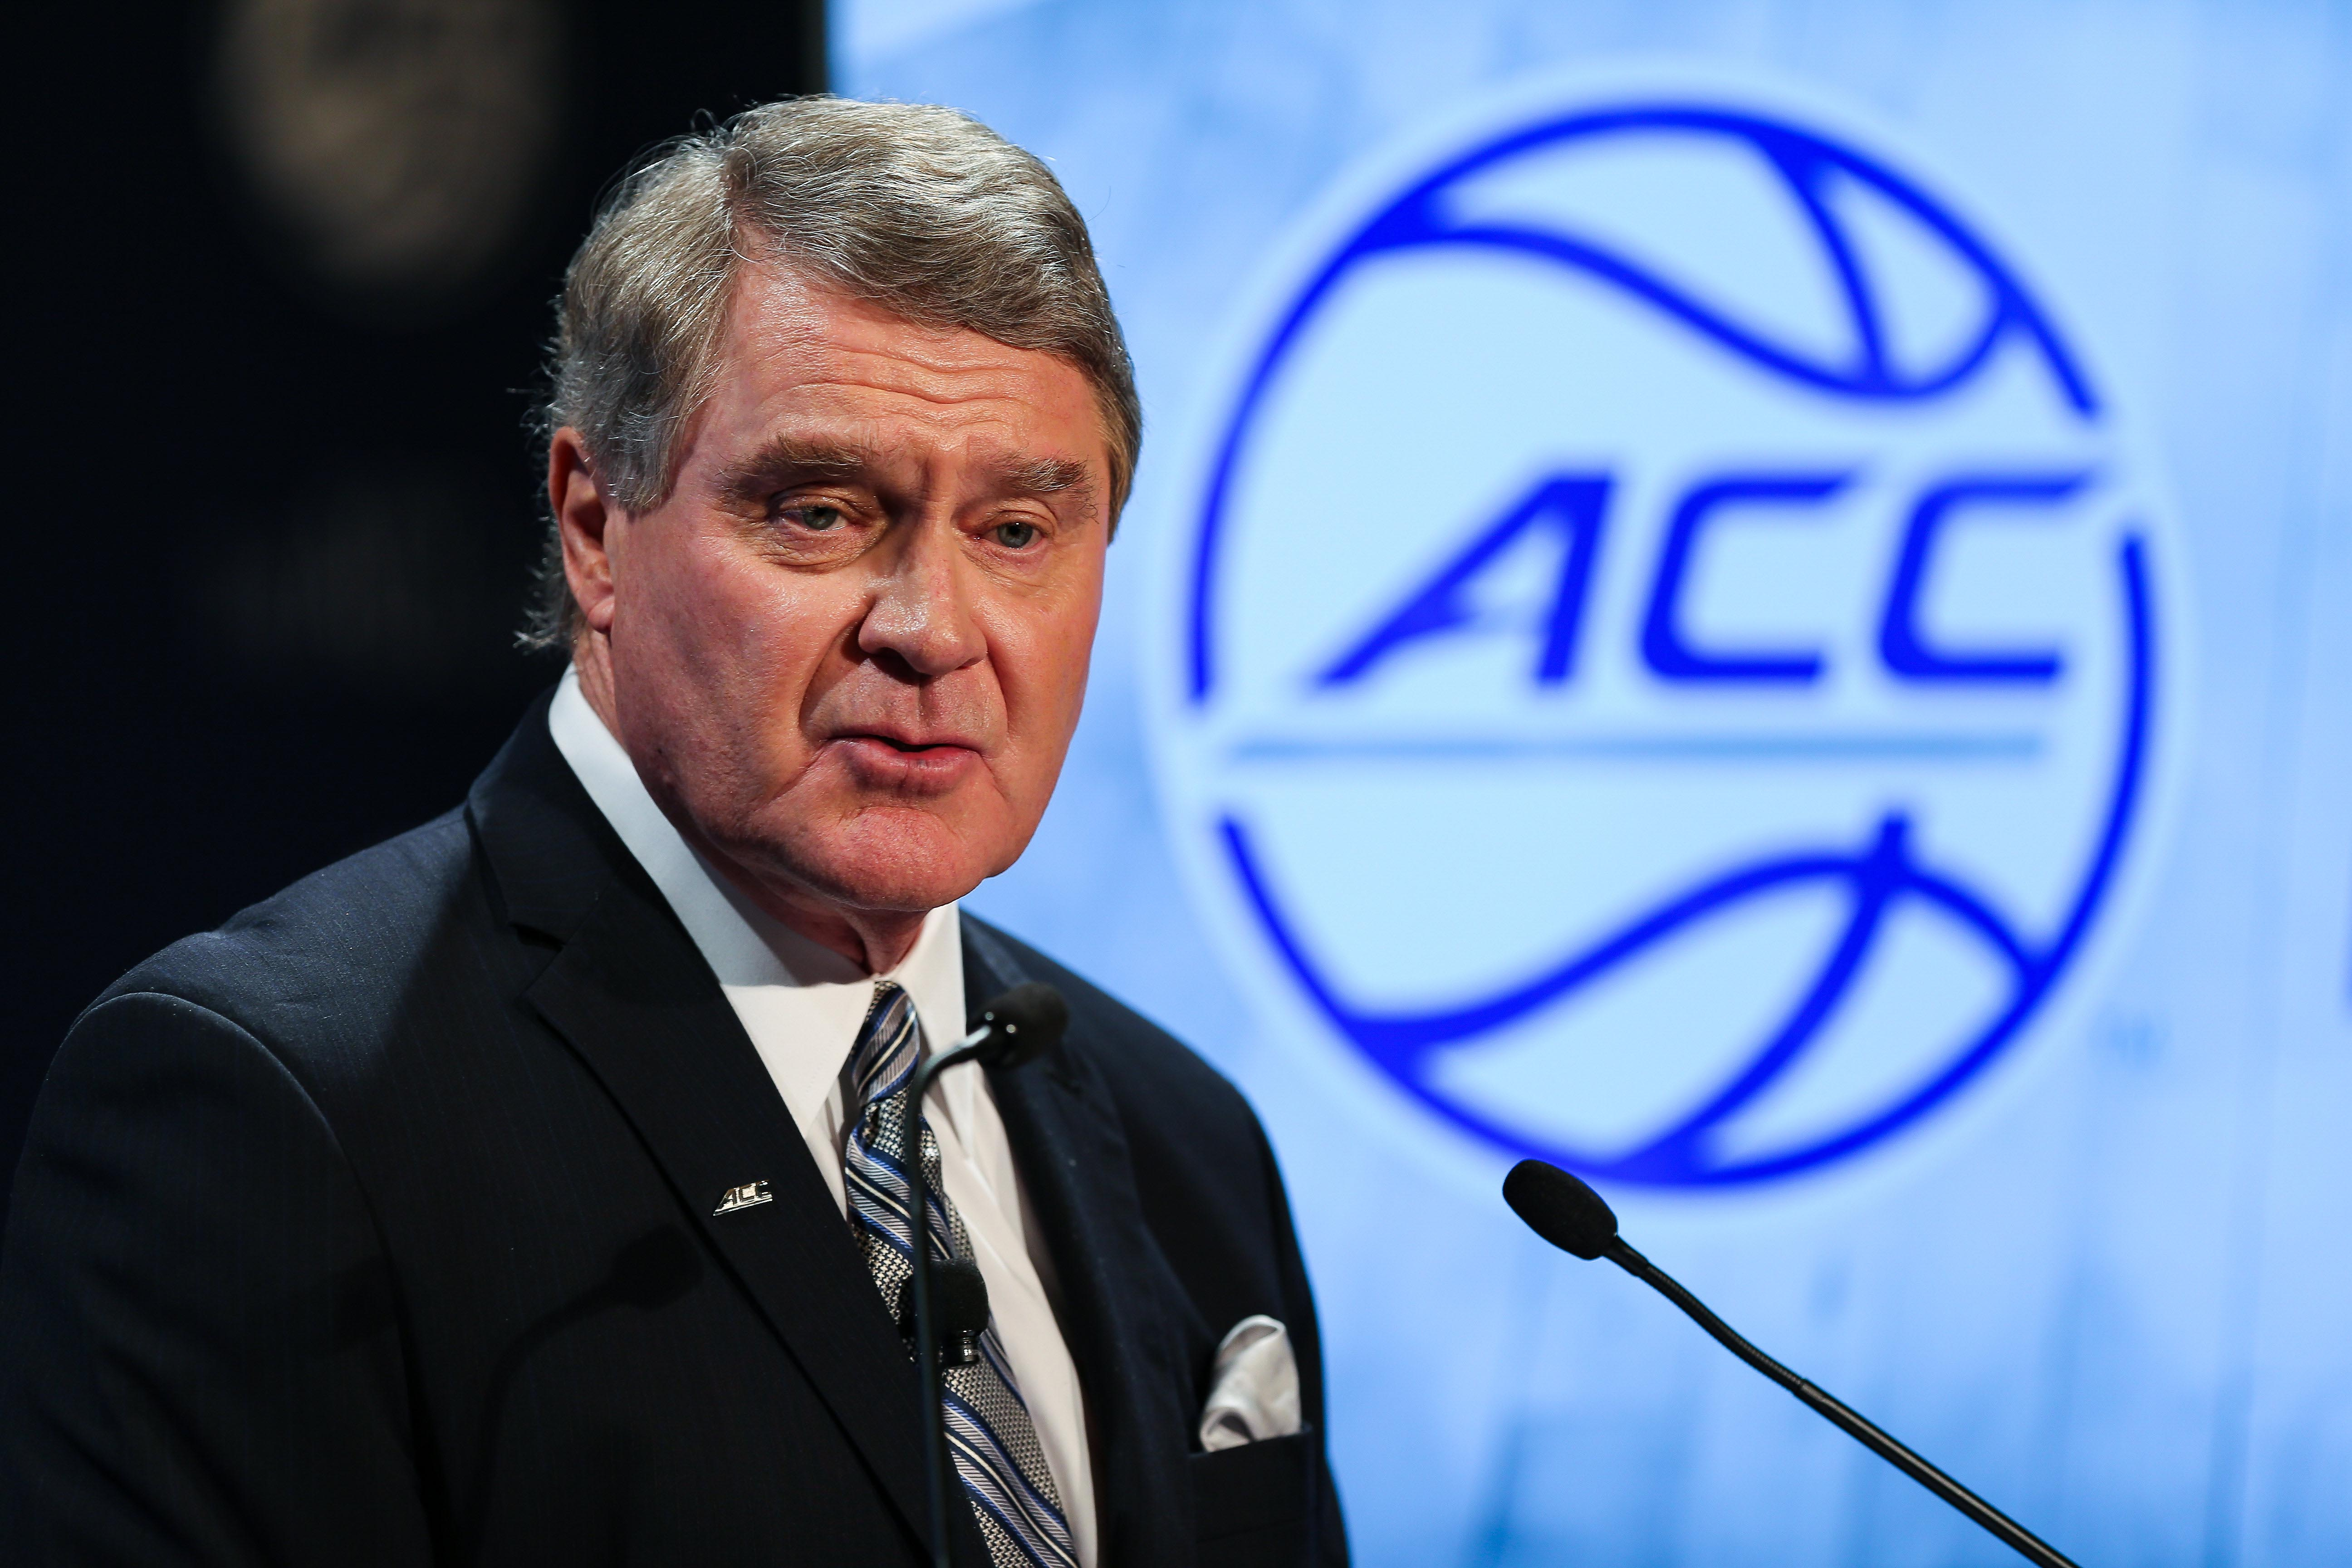 ACC Commissioner John Swofford